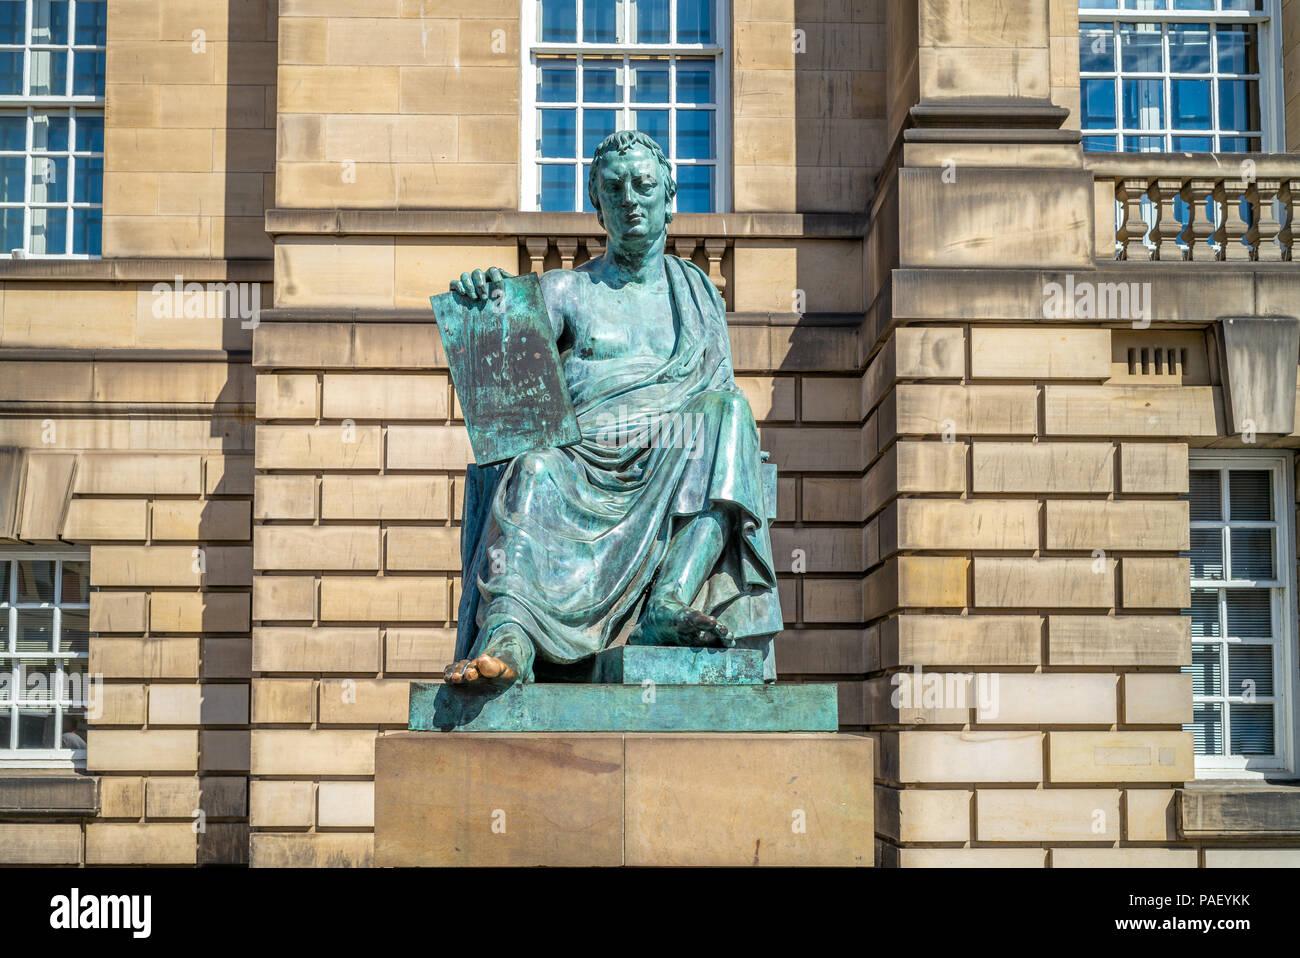 Statue of David Hume, on Royal Mile in Edinburgh Stock Photo